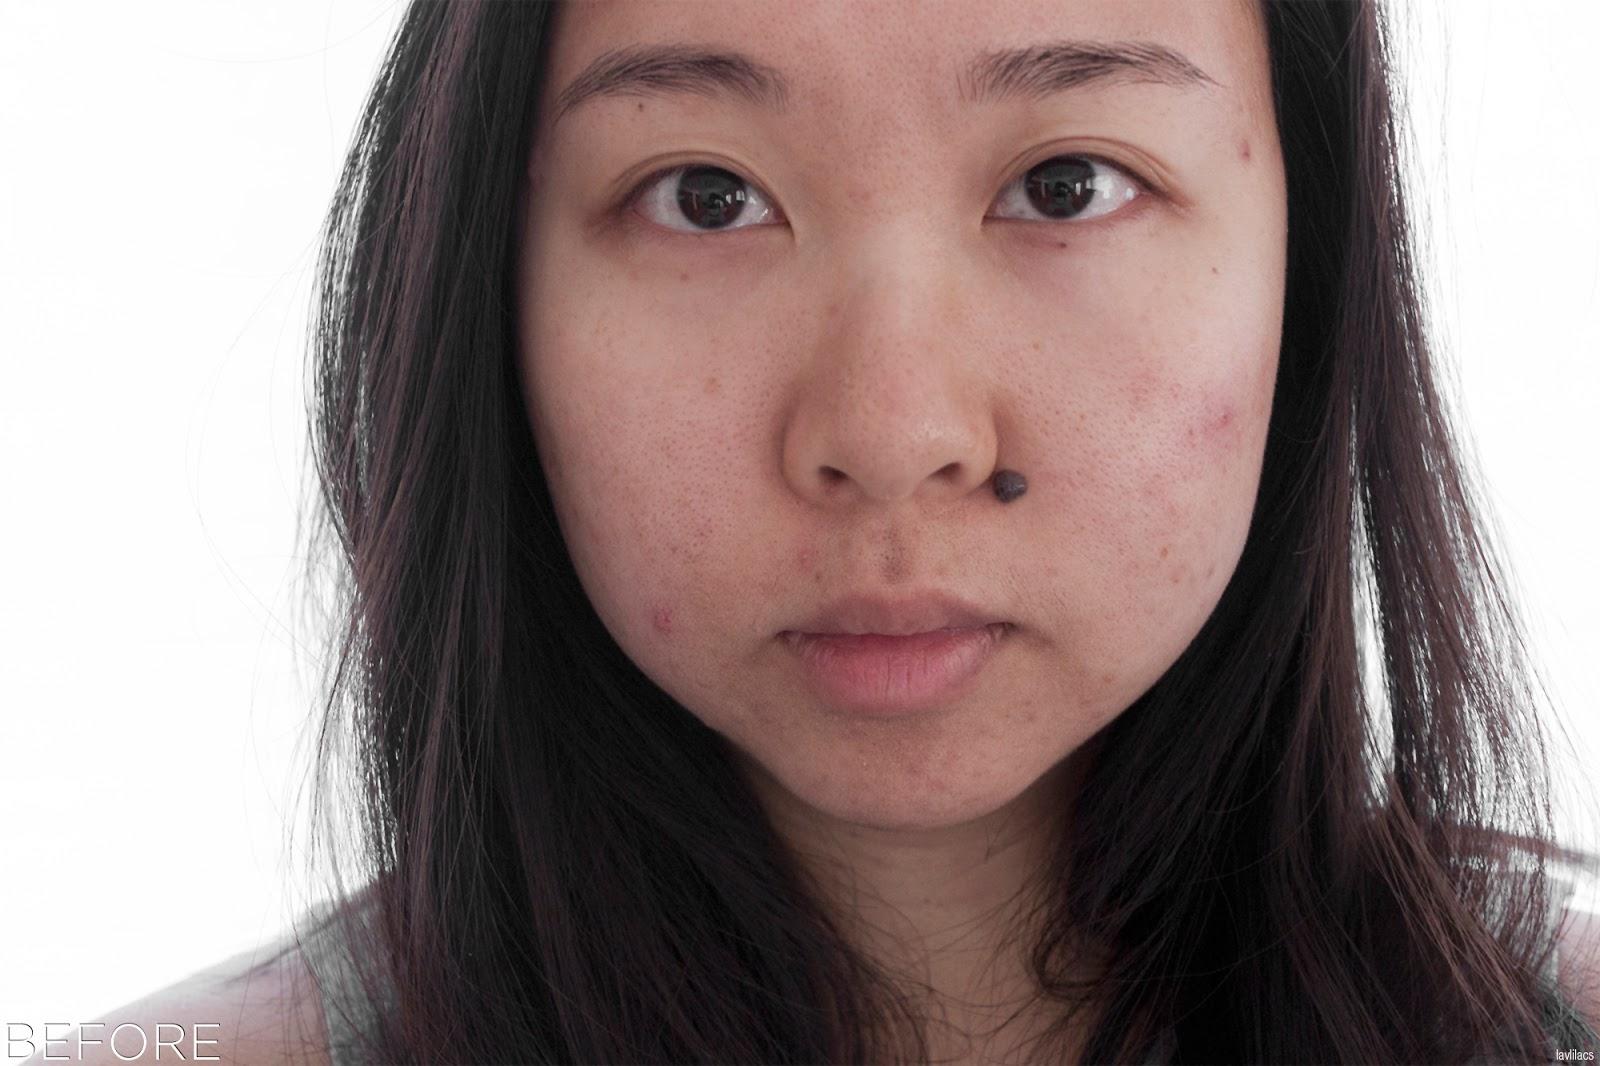 tria Hair Removal Laser Facial Hair Before